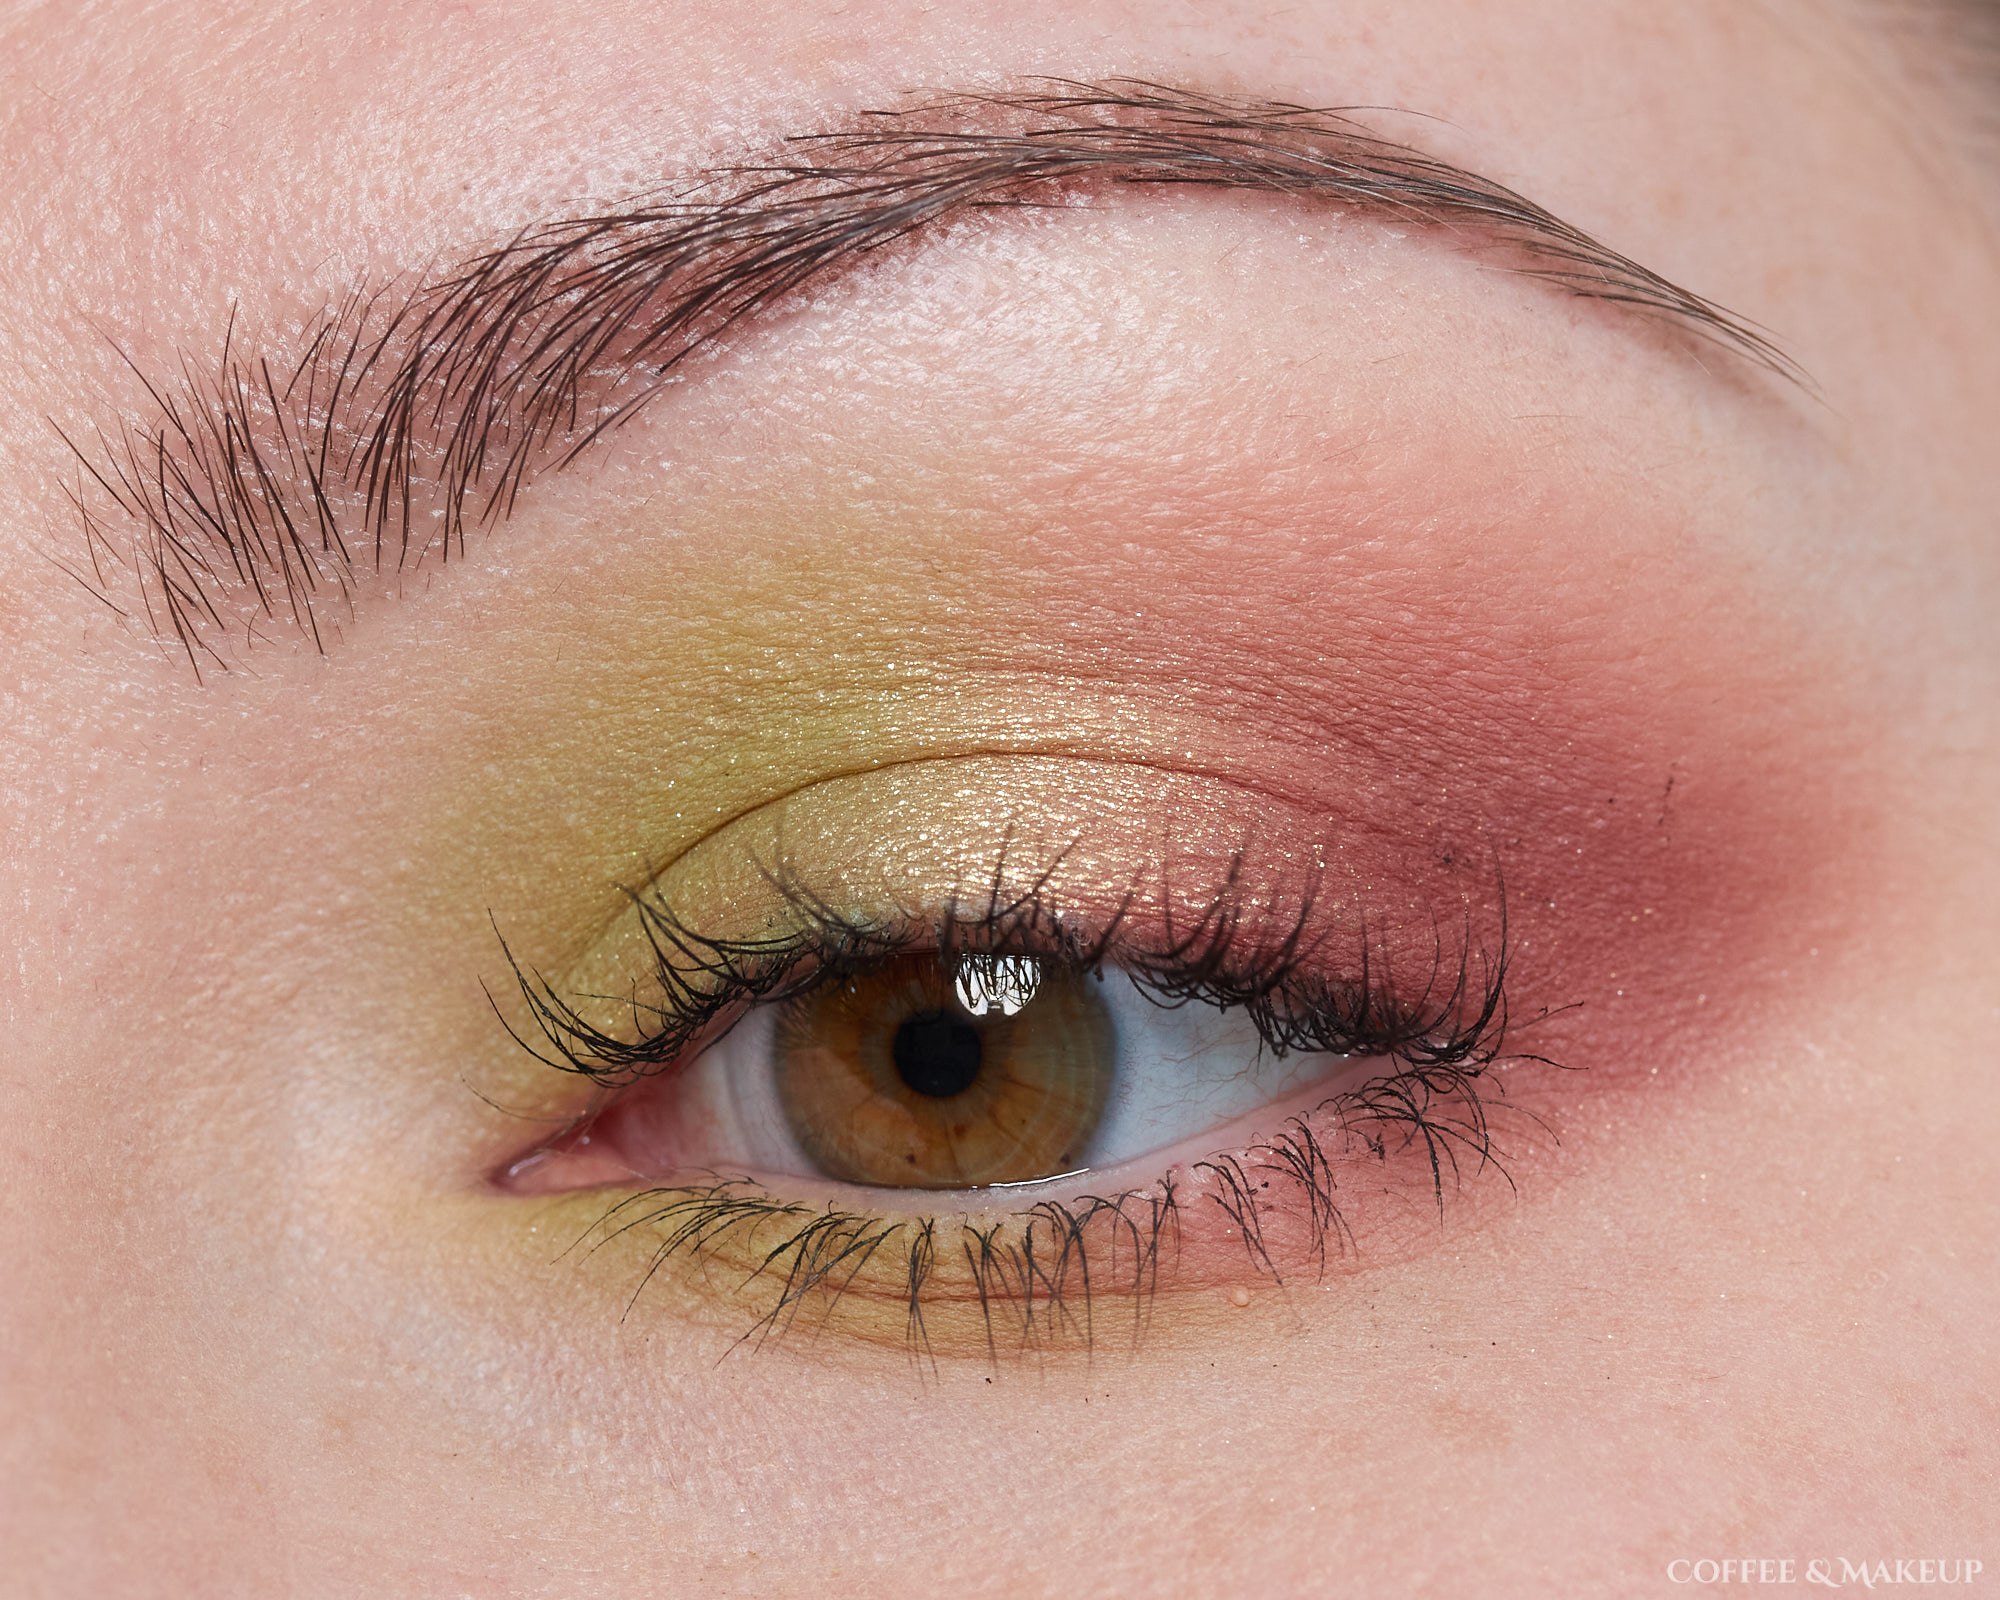 Makeup Geek Soft Focus Colors Look #2 (unedited)